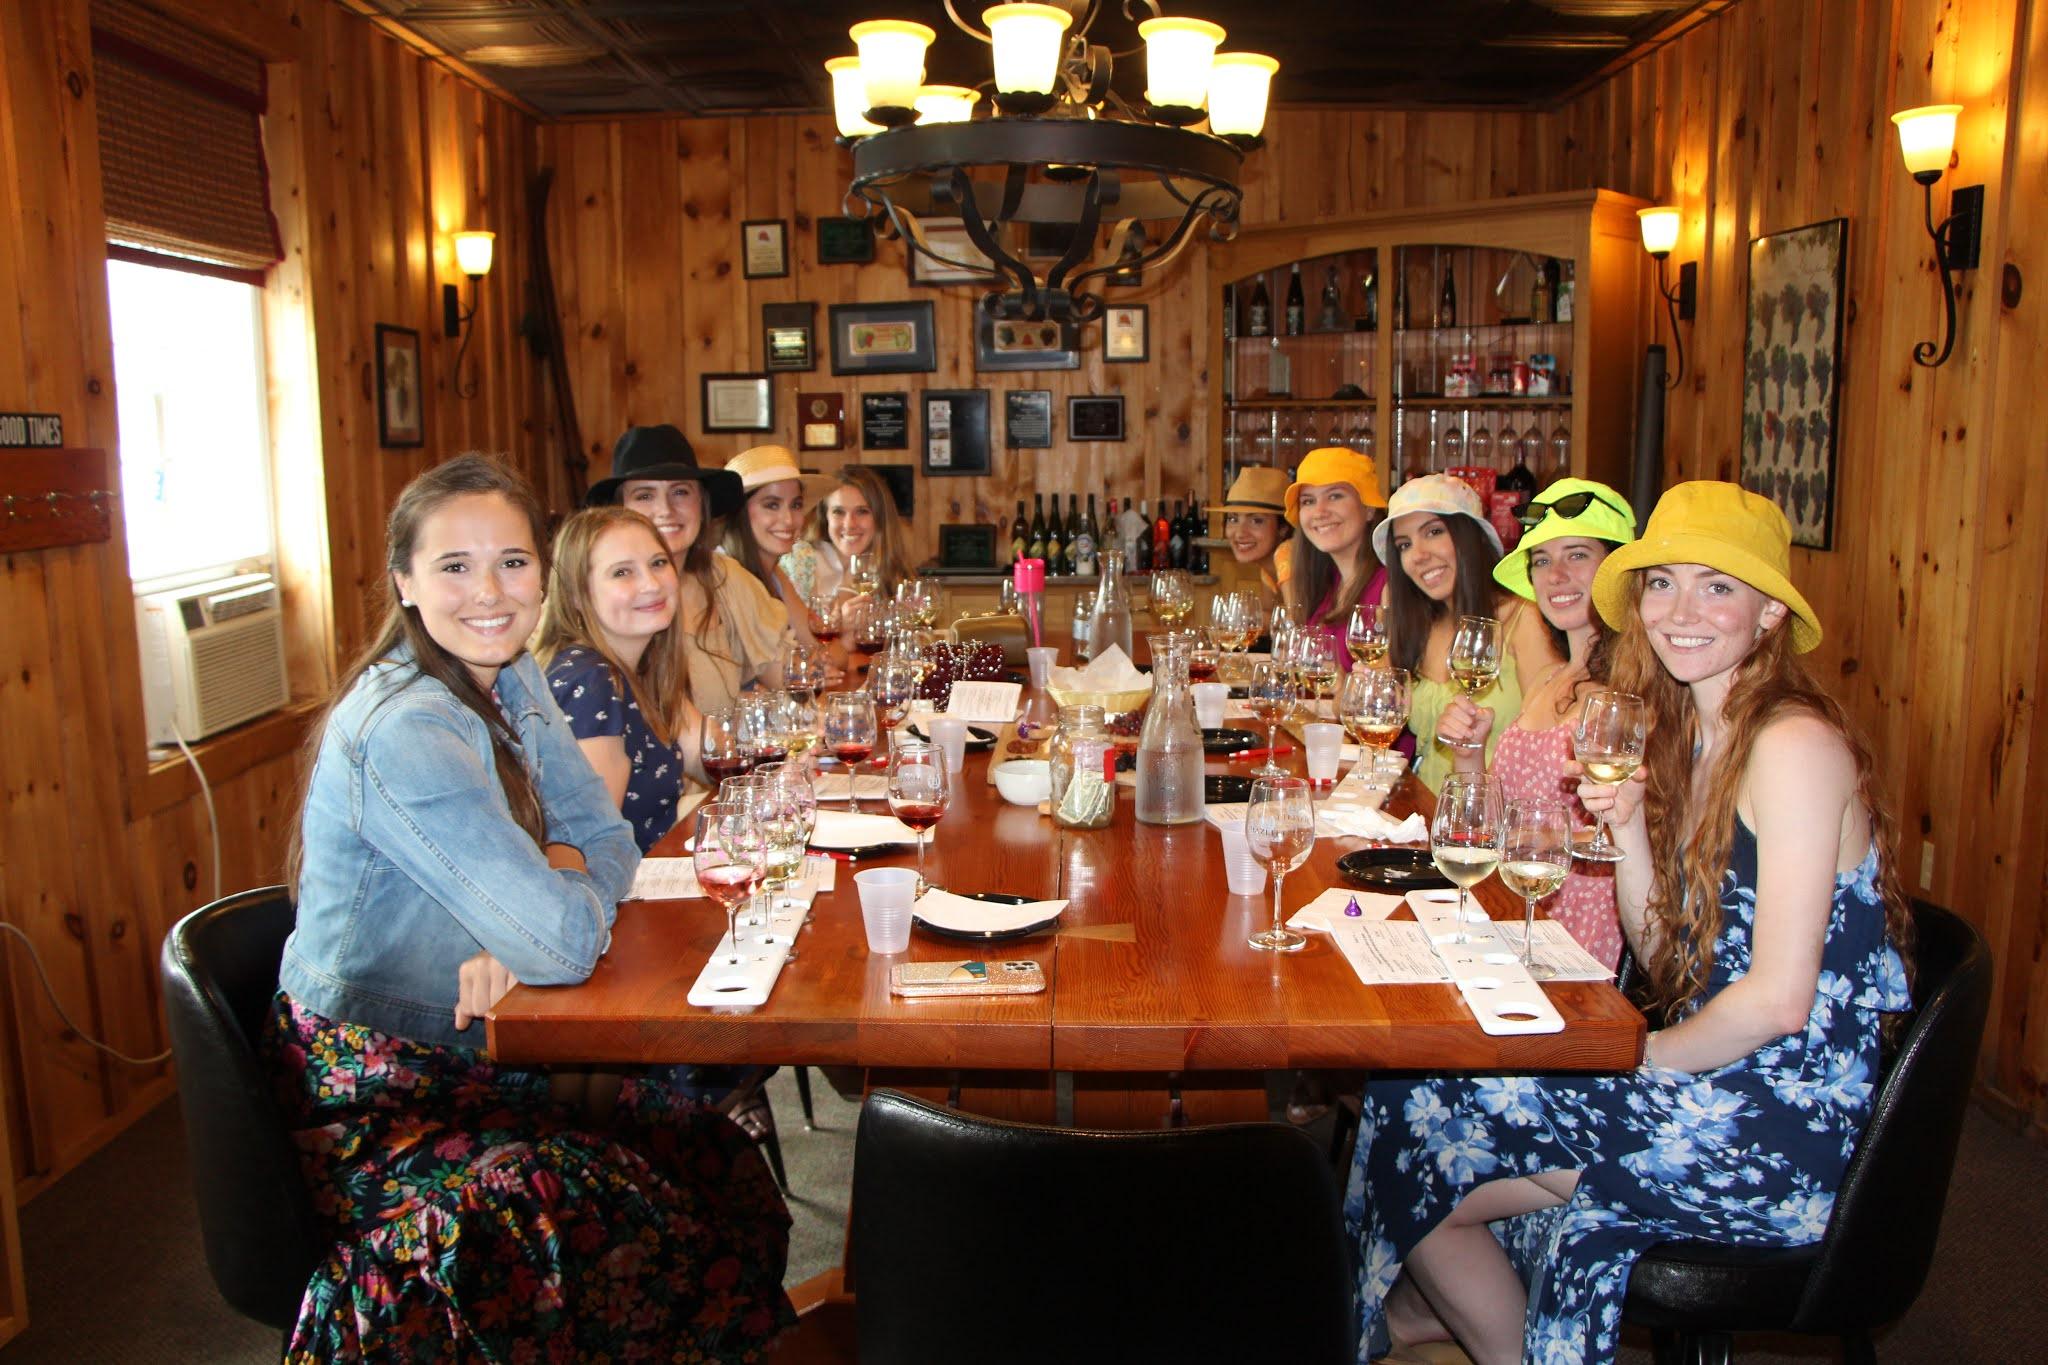 wine tasting, private tasting room, finger lakes, lake seneca, upstate new york